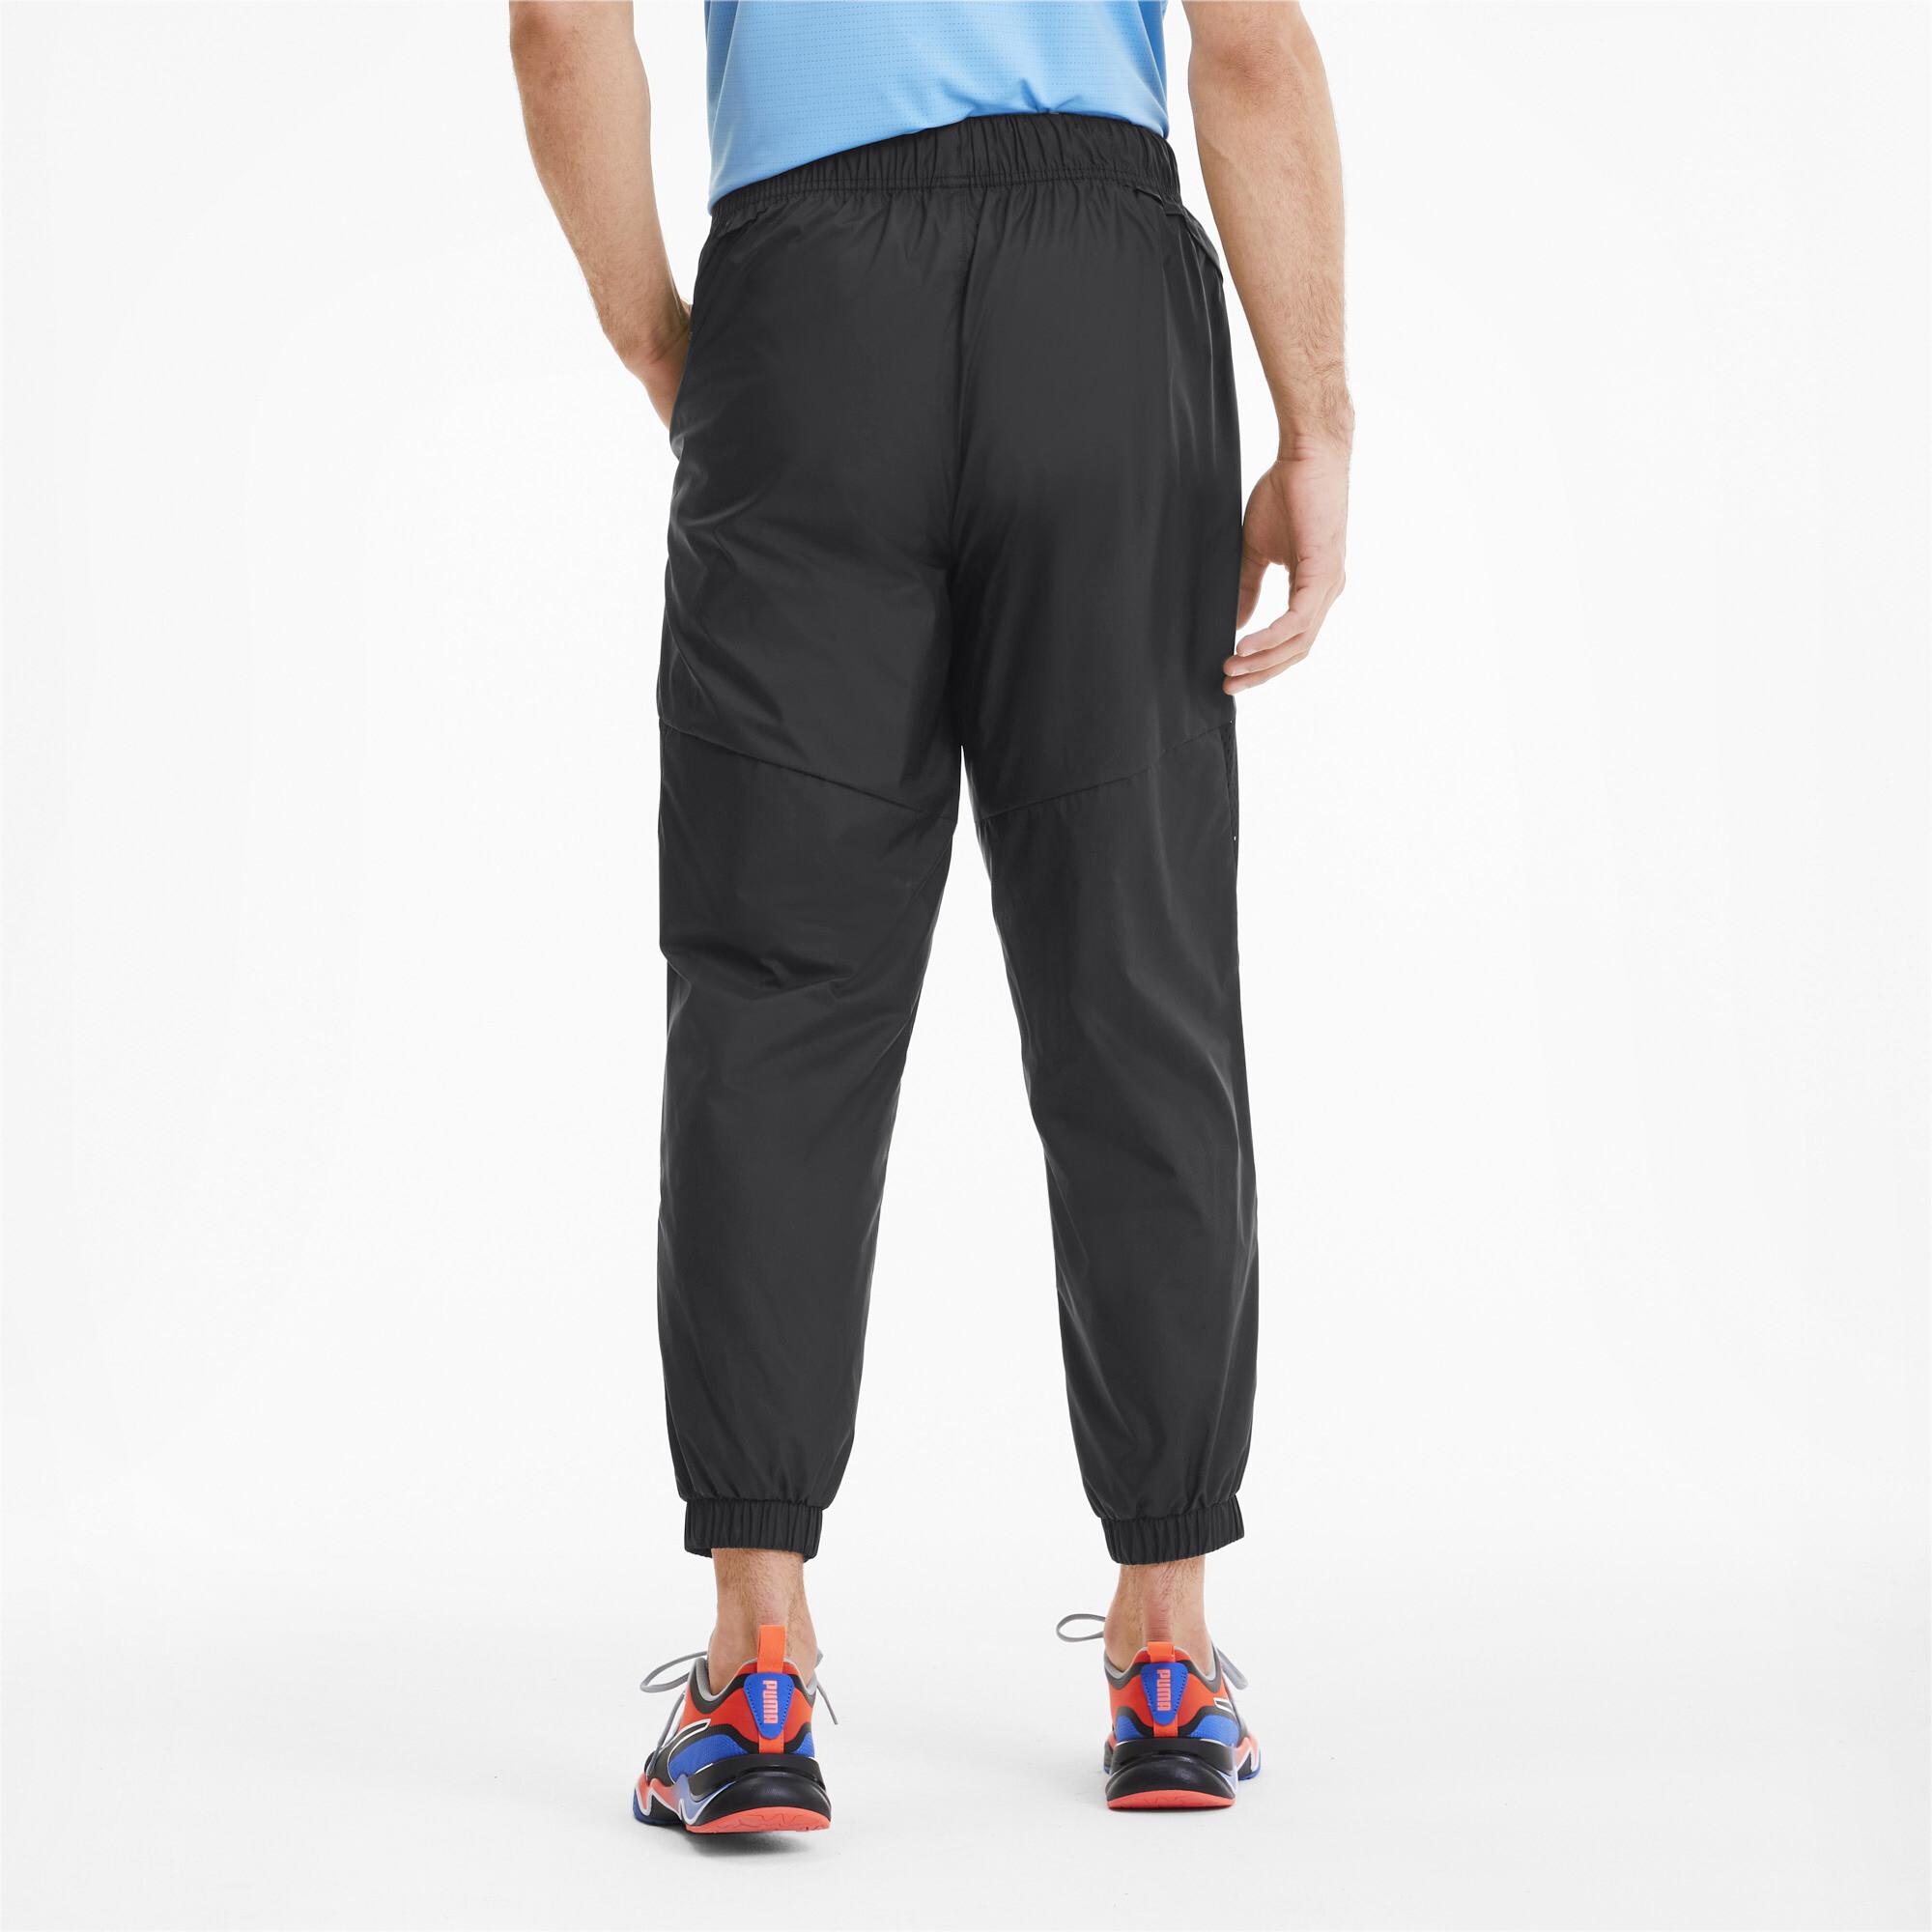 PUMA-Reactive-Men-039-s-Woven-Training-Pants-Men-Woven-Pants-Training thumbnail 5